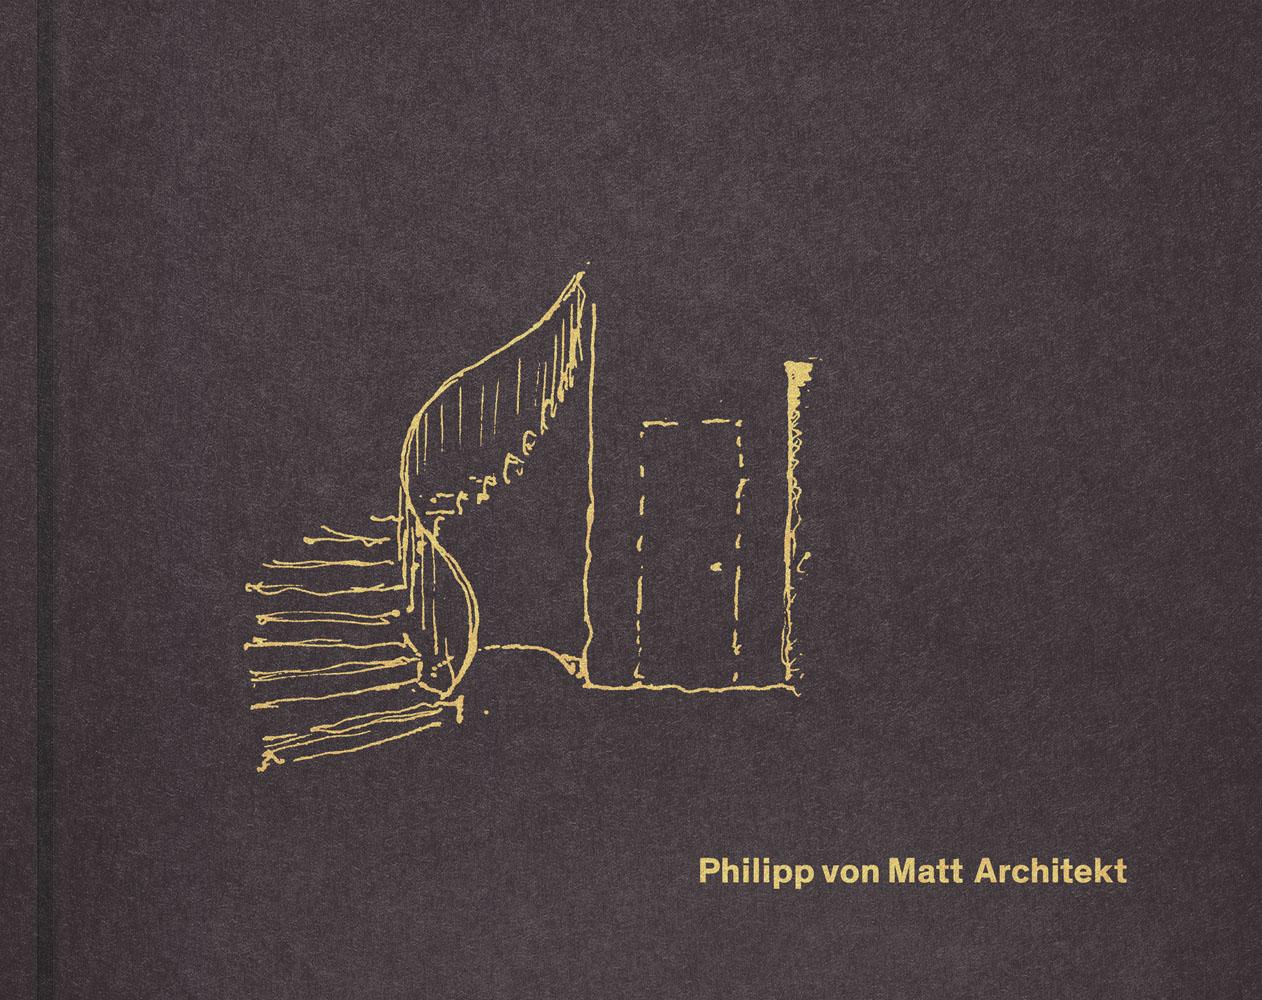 Philipp von Matt